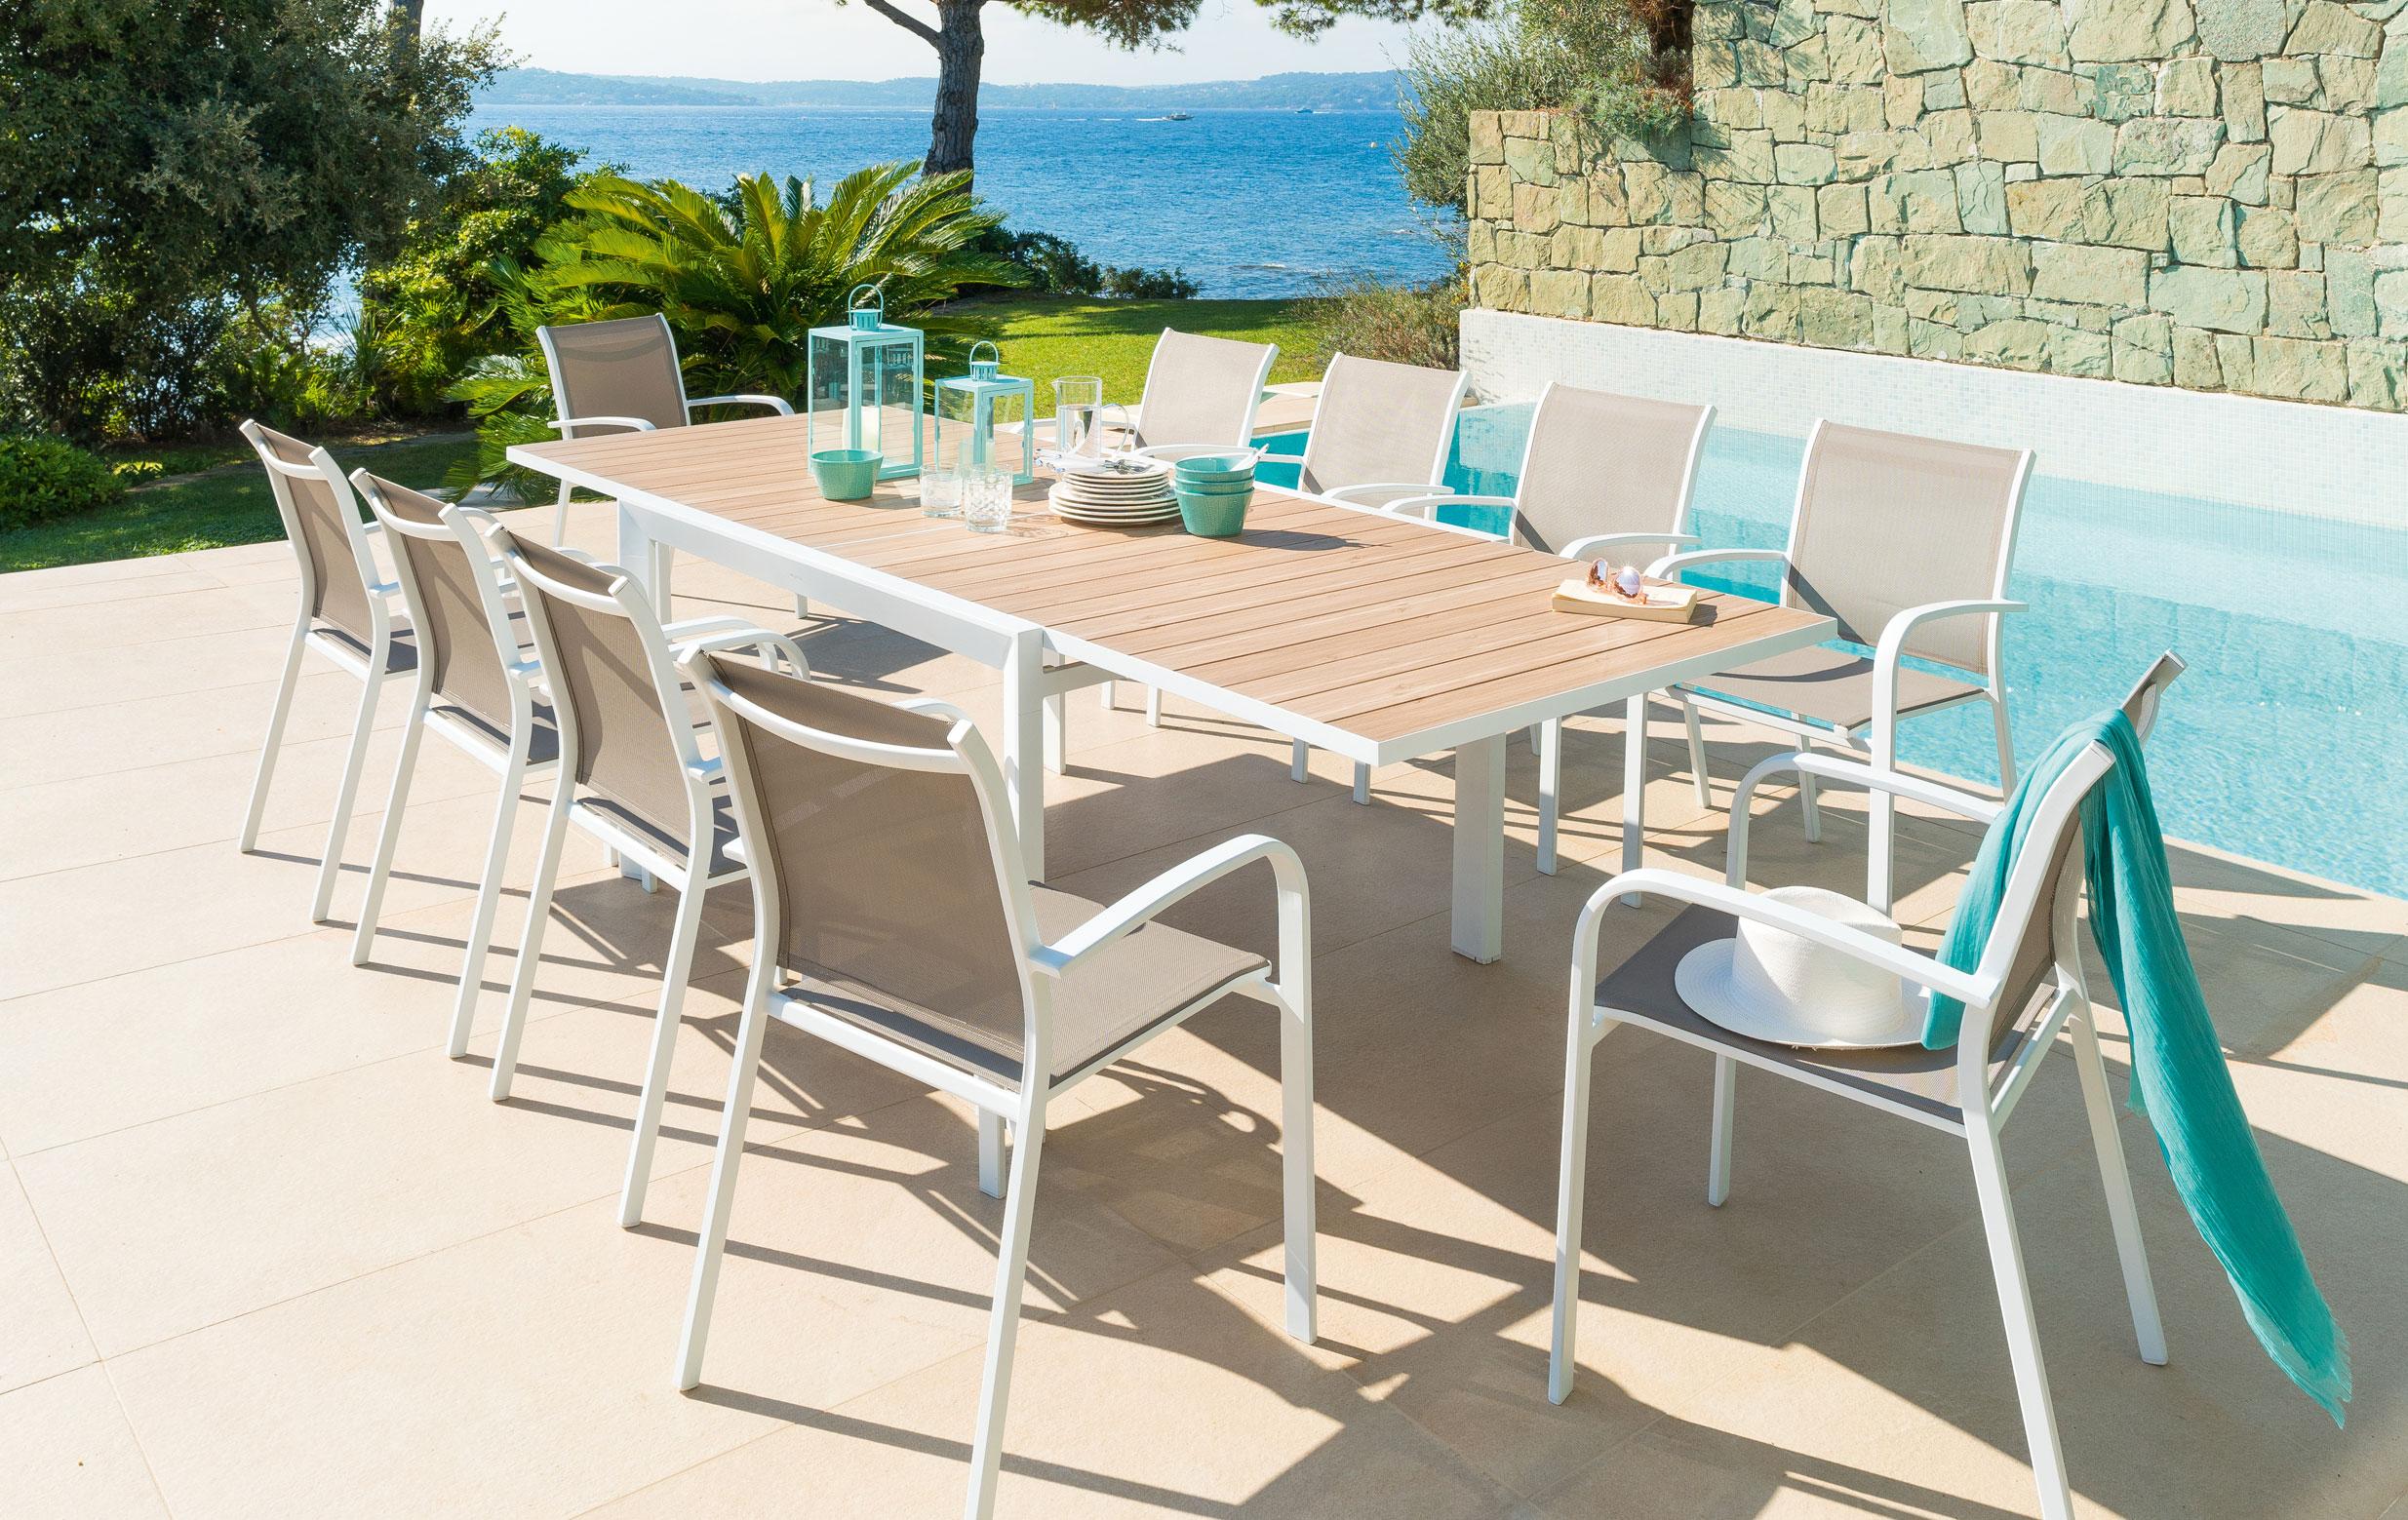 JJA | Hespéride: Garden furniture